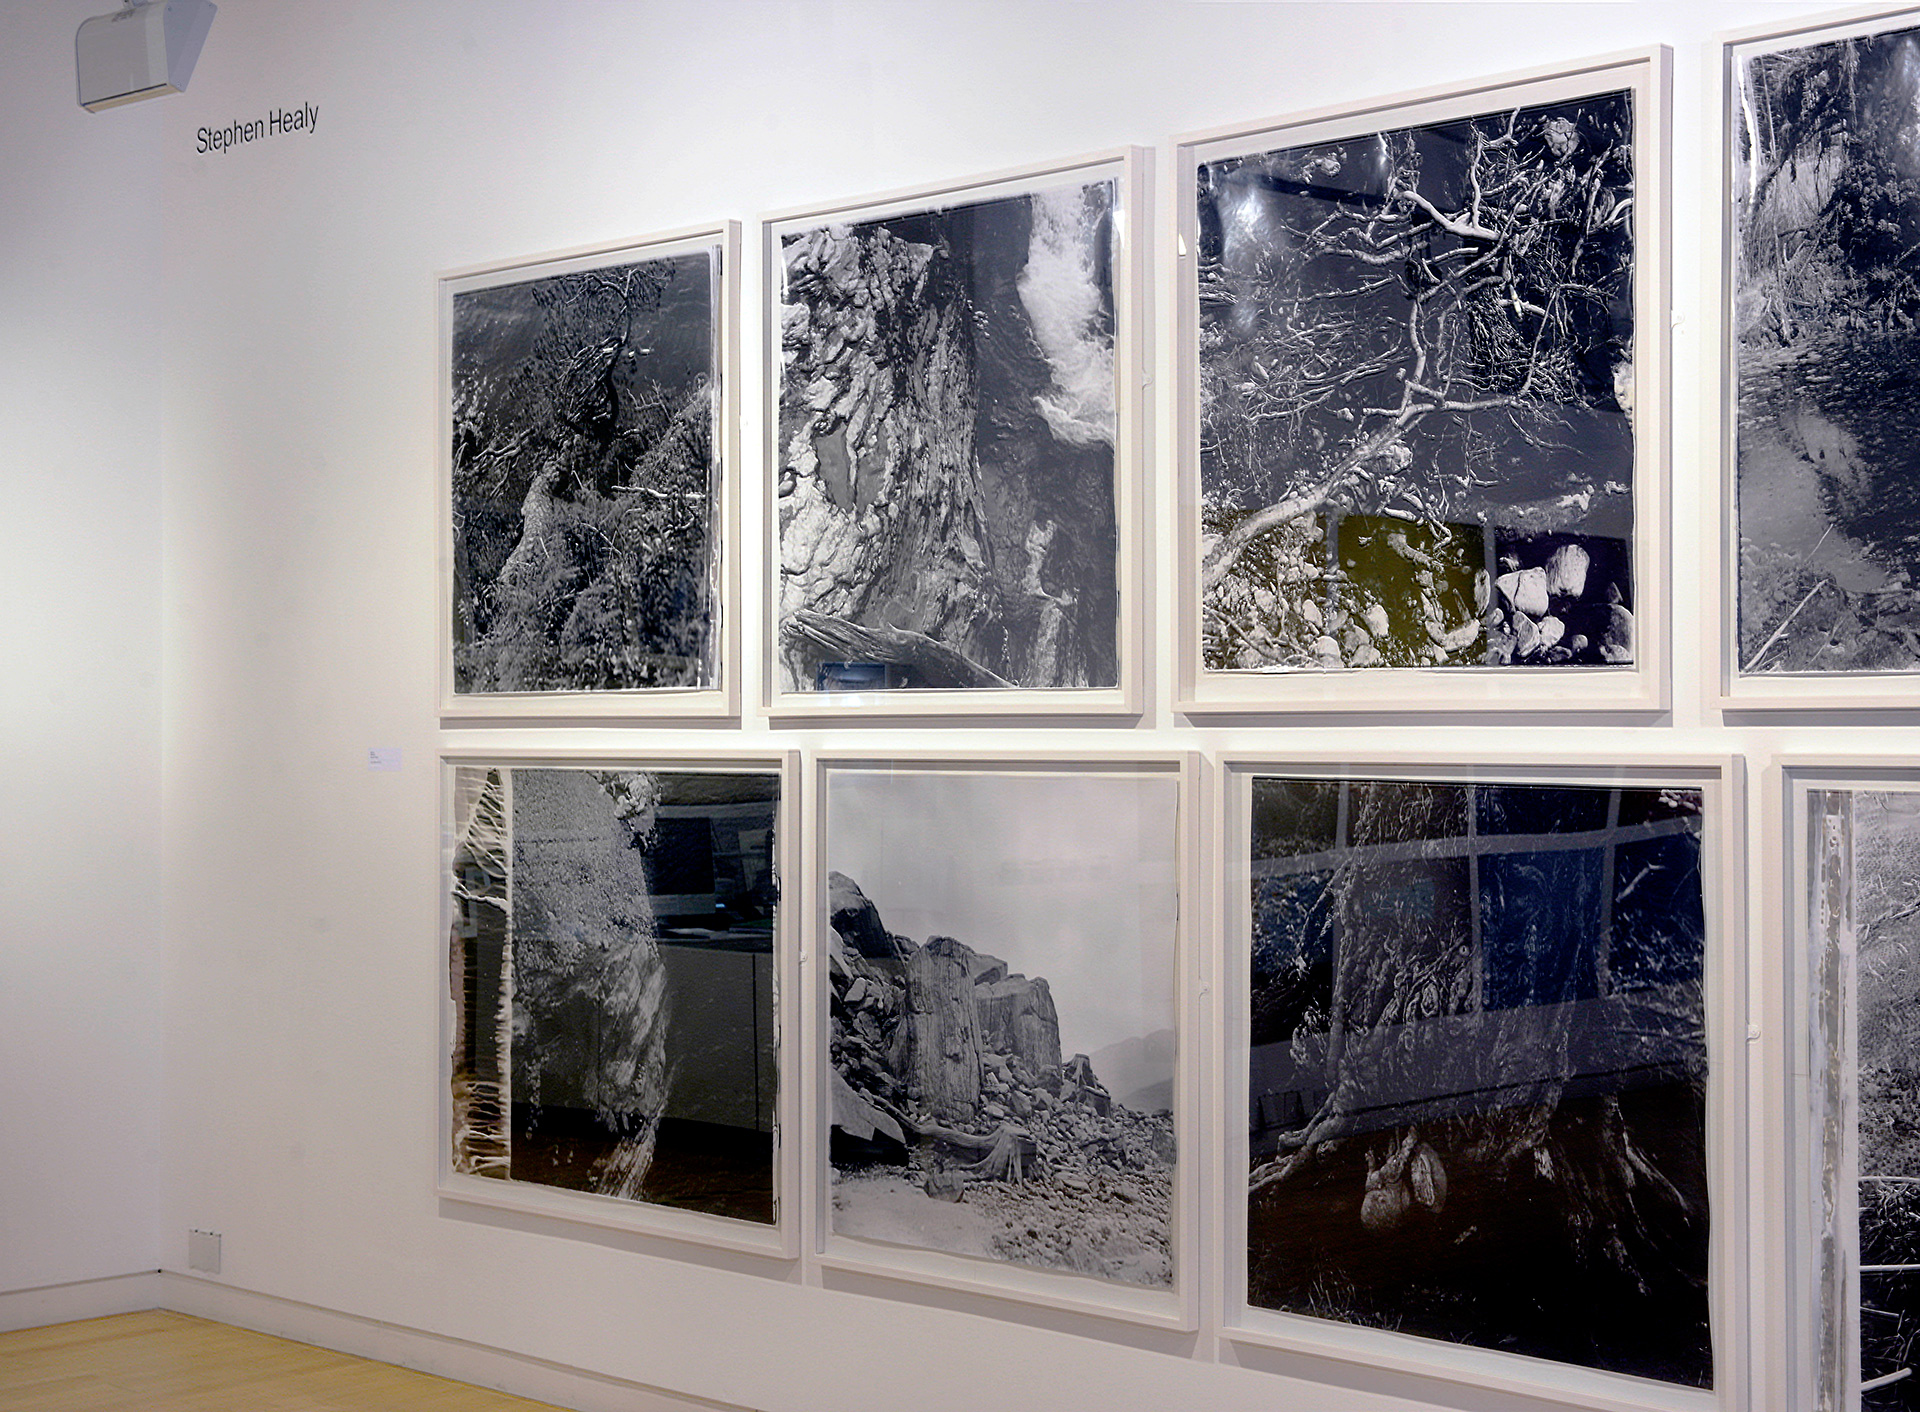 Stephen Healy, Installation view